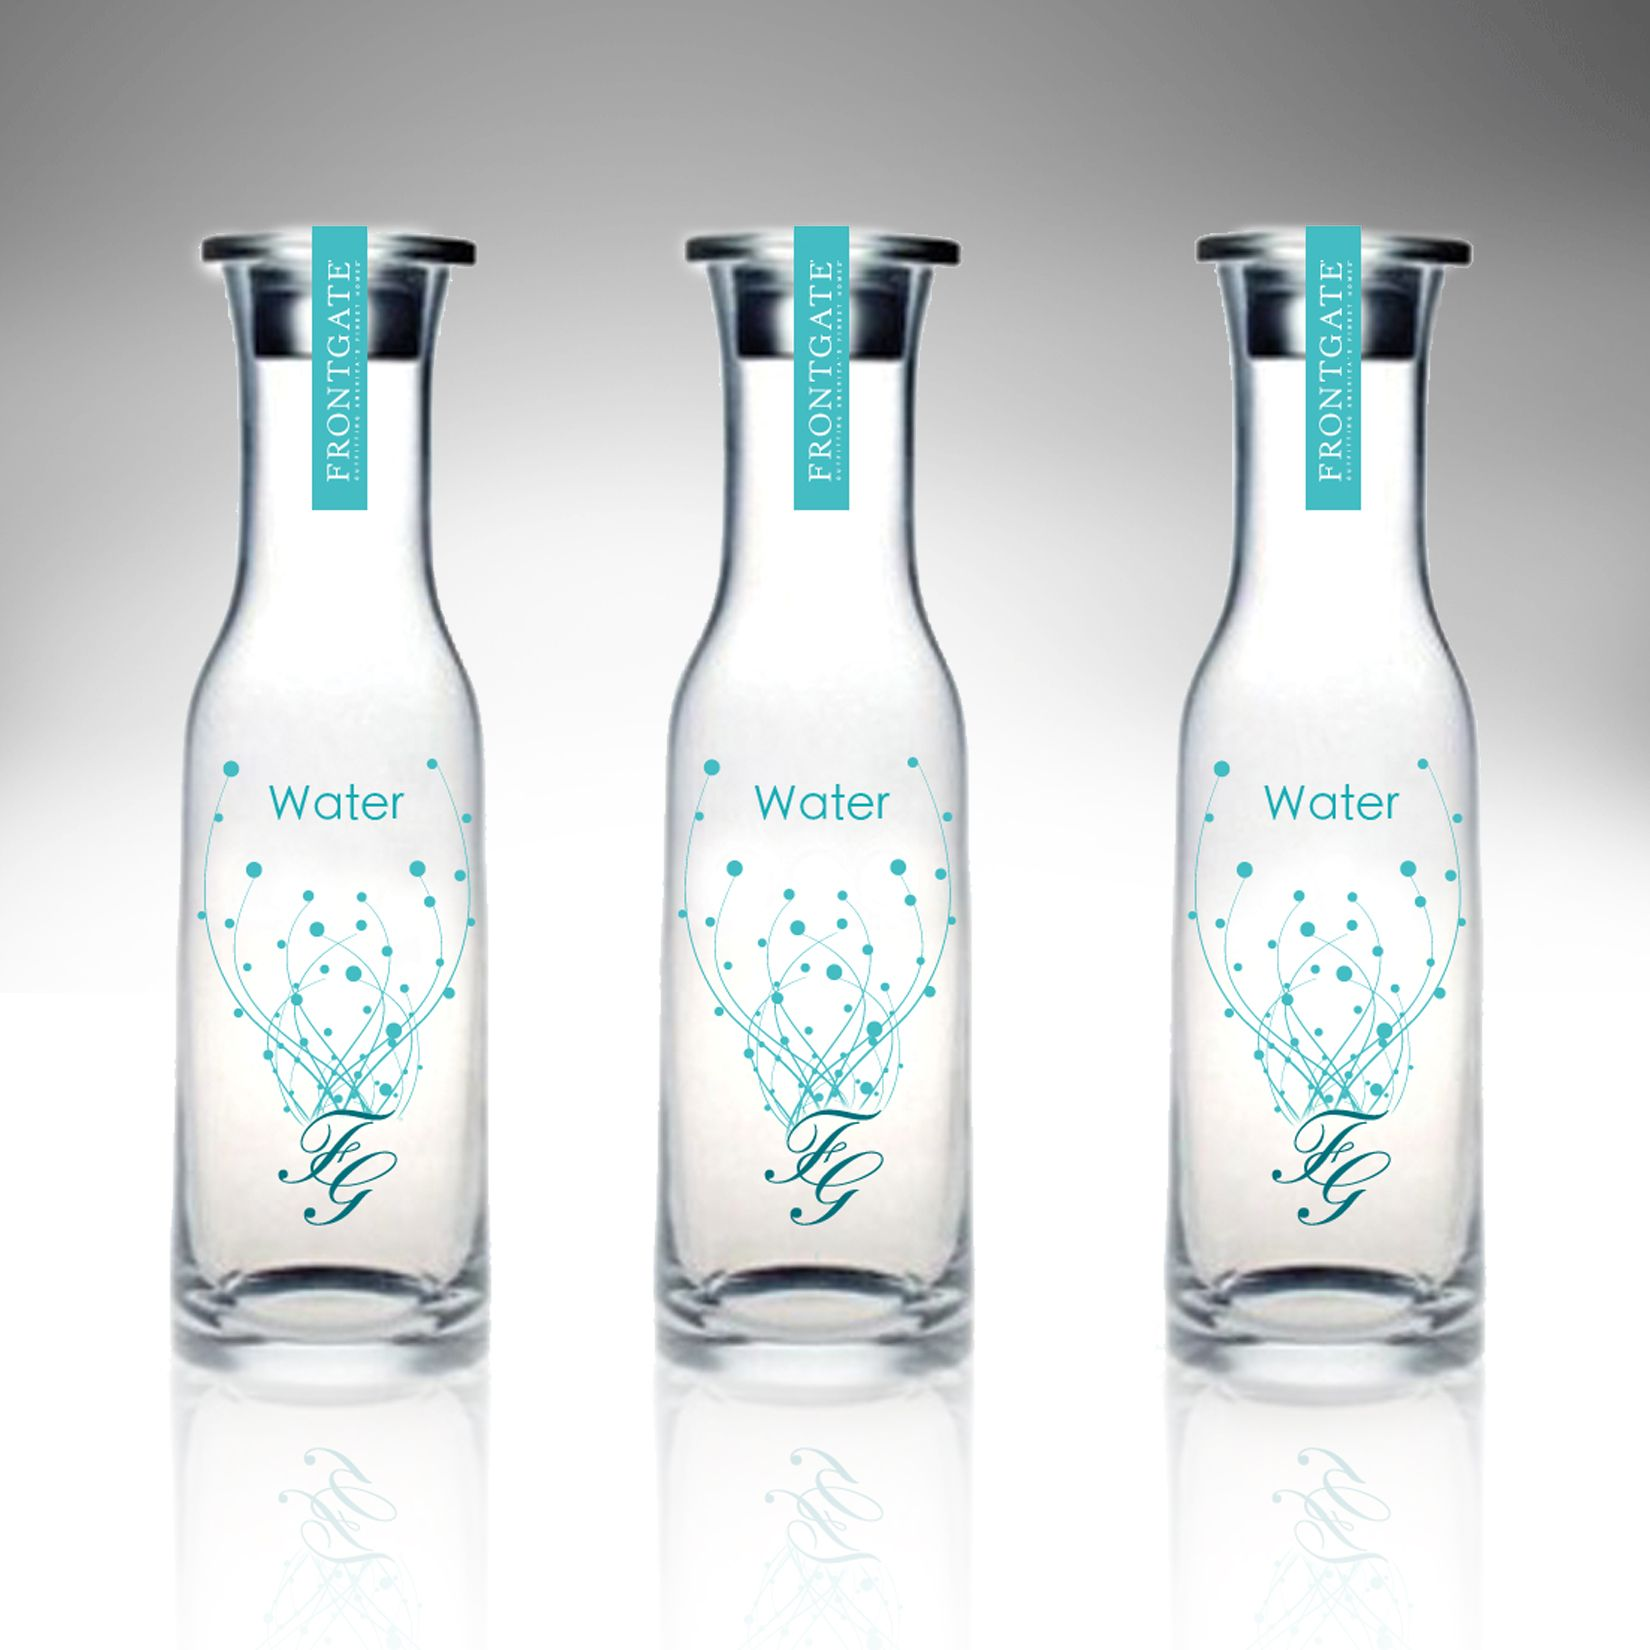 Water packaging design water packaging pinterest for Decor water bottle